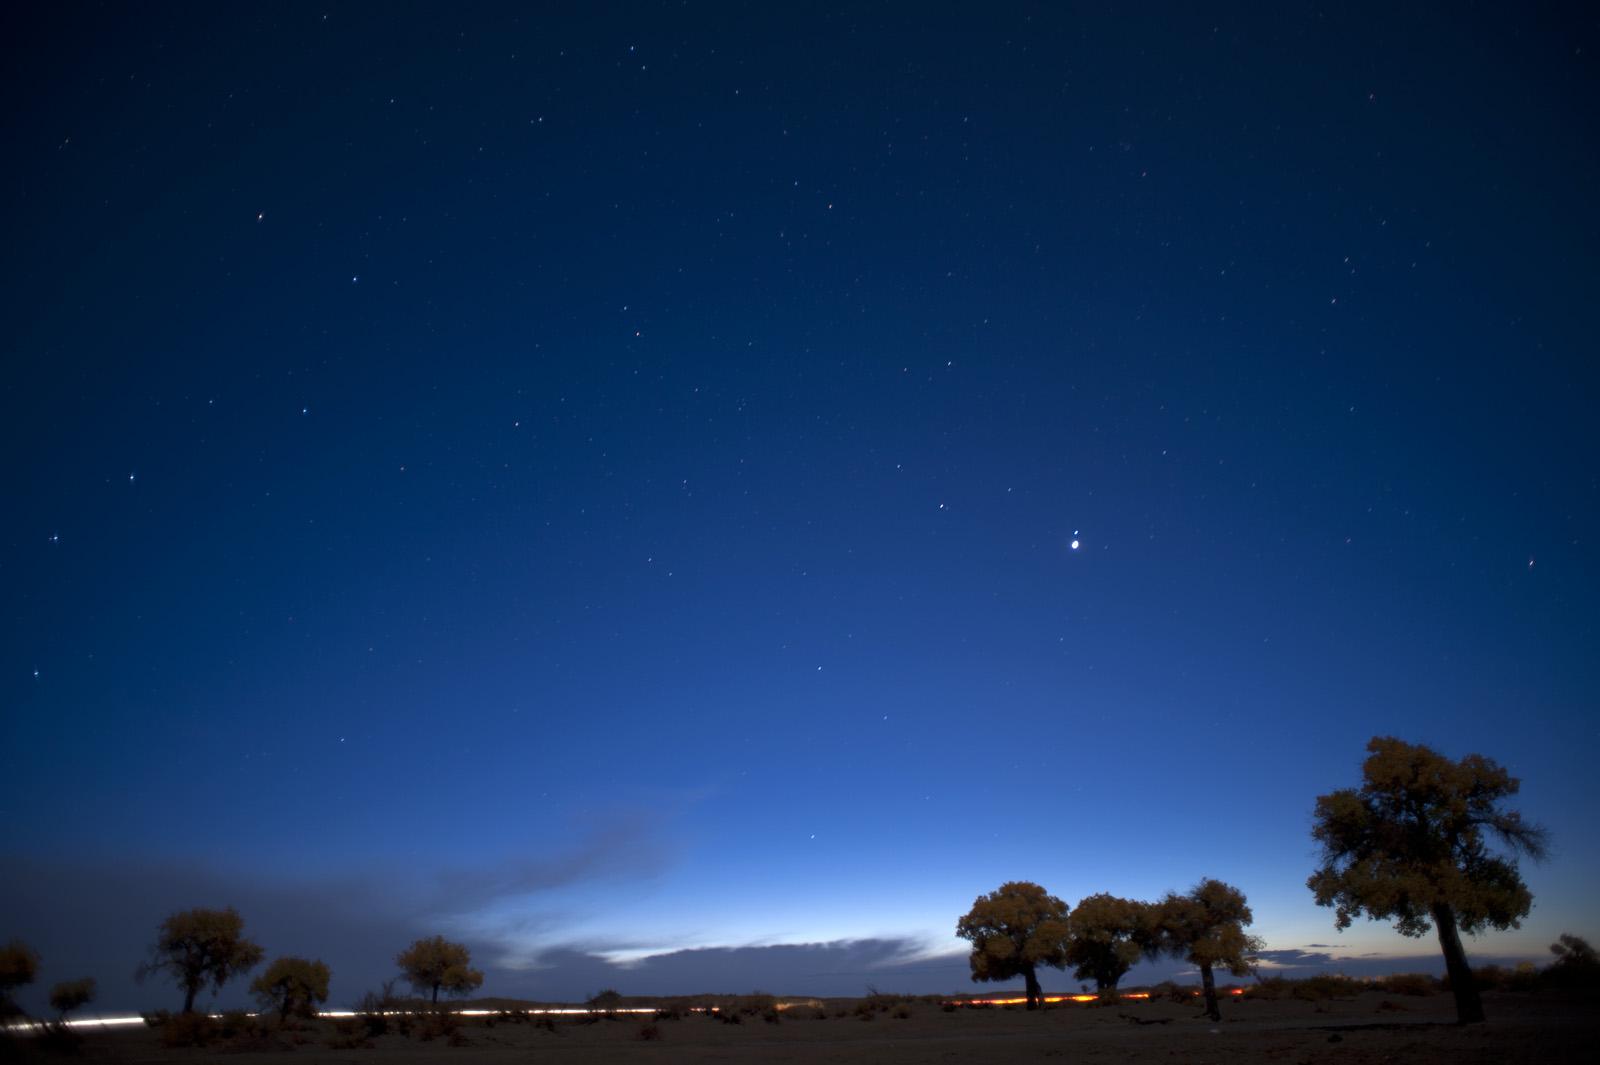 kxty作品:额济纳的夜空